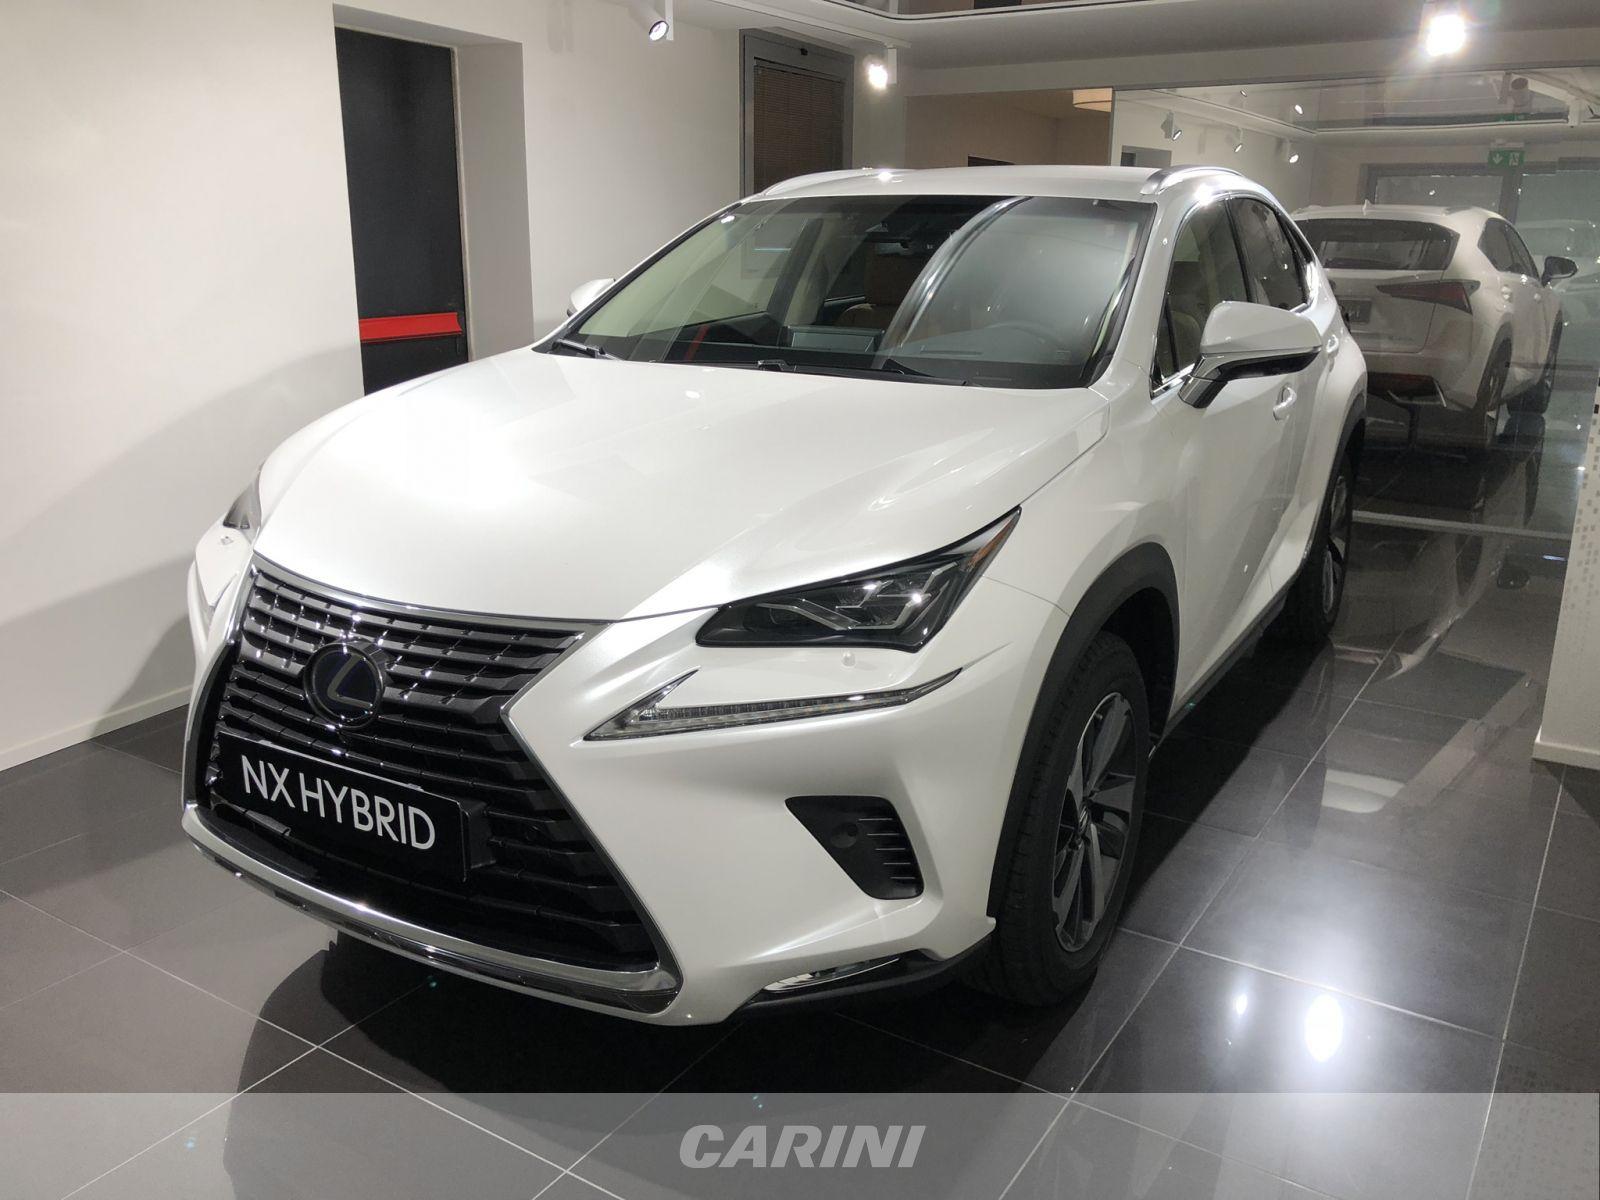 CARINI Lexus NX